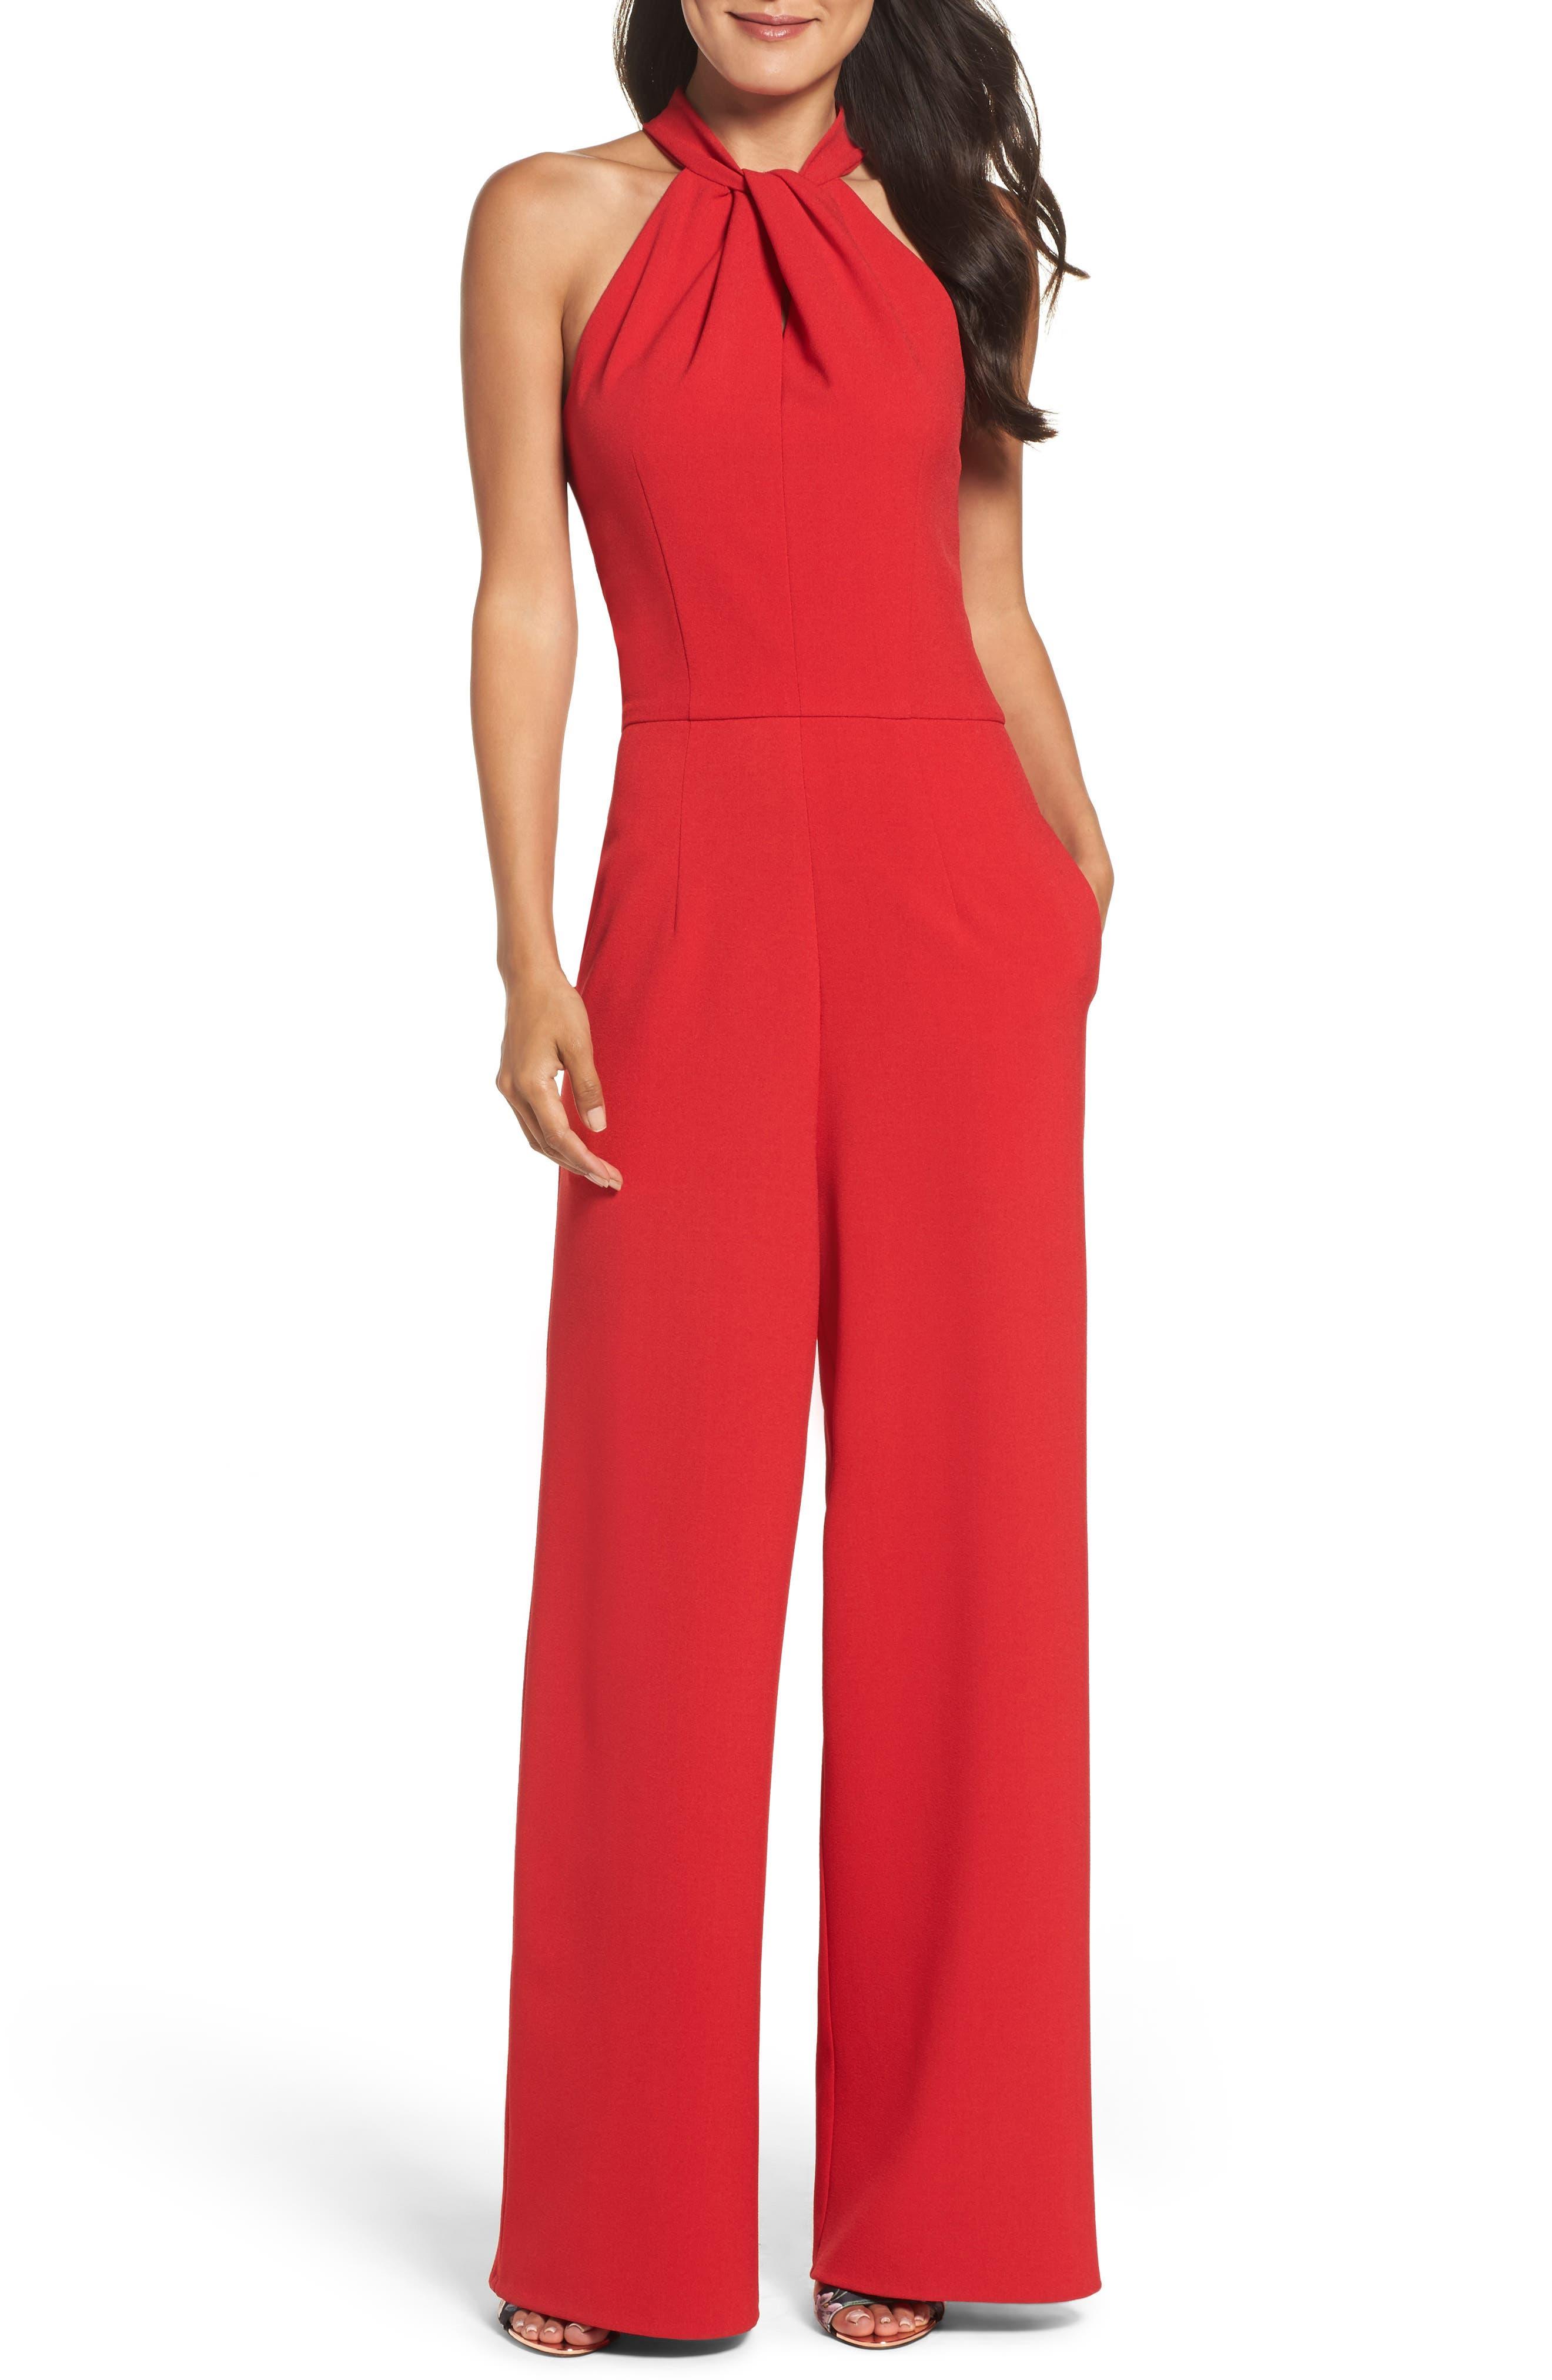 70s Jumpsuit   Disco Jumpsuits – Sequin, Striped, Gold, White, Black Womens Julia Jordan Halter Wide Leg Jumpsuit Size 16 - Red $138.00 AT vintagedancer.com